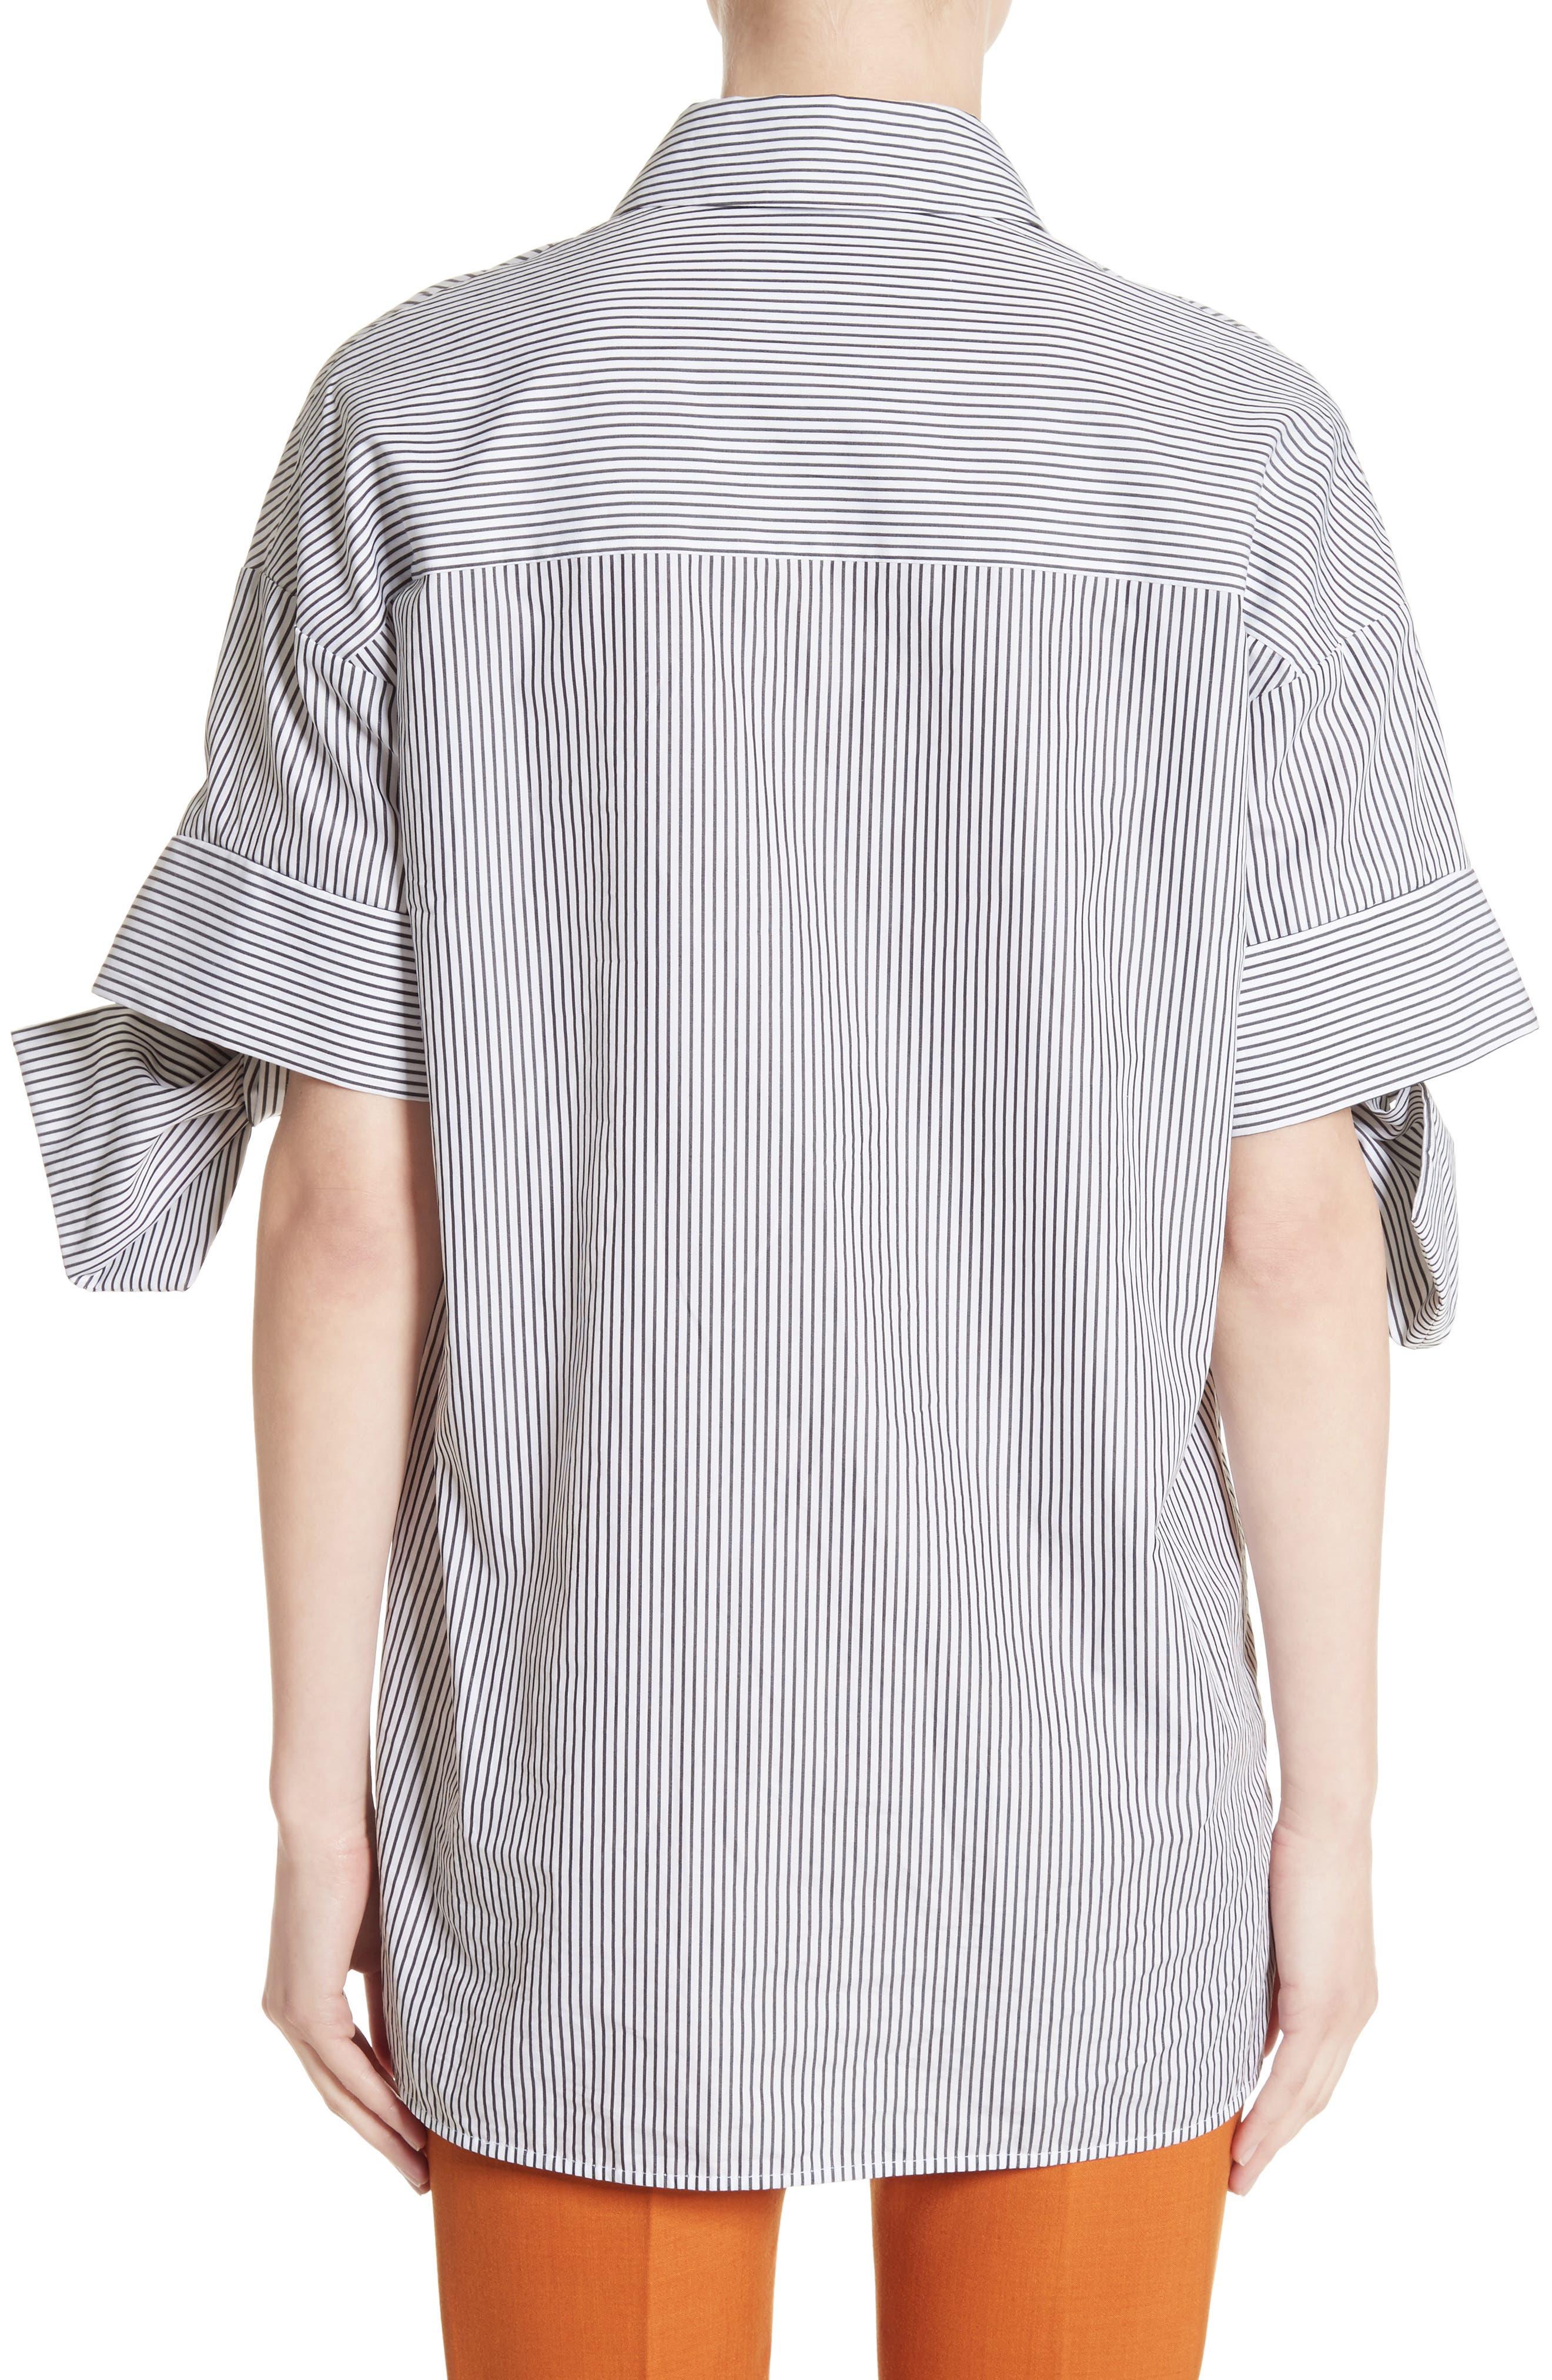 Bow Sleeve Shirt,                             Alternate thumbnail 2, color,                             001